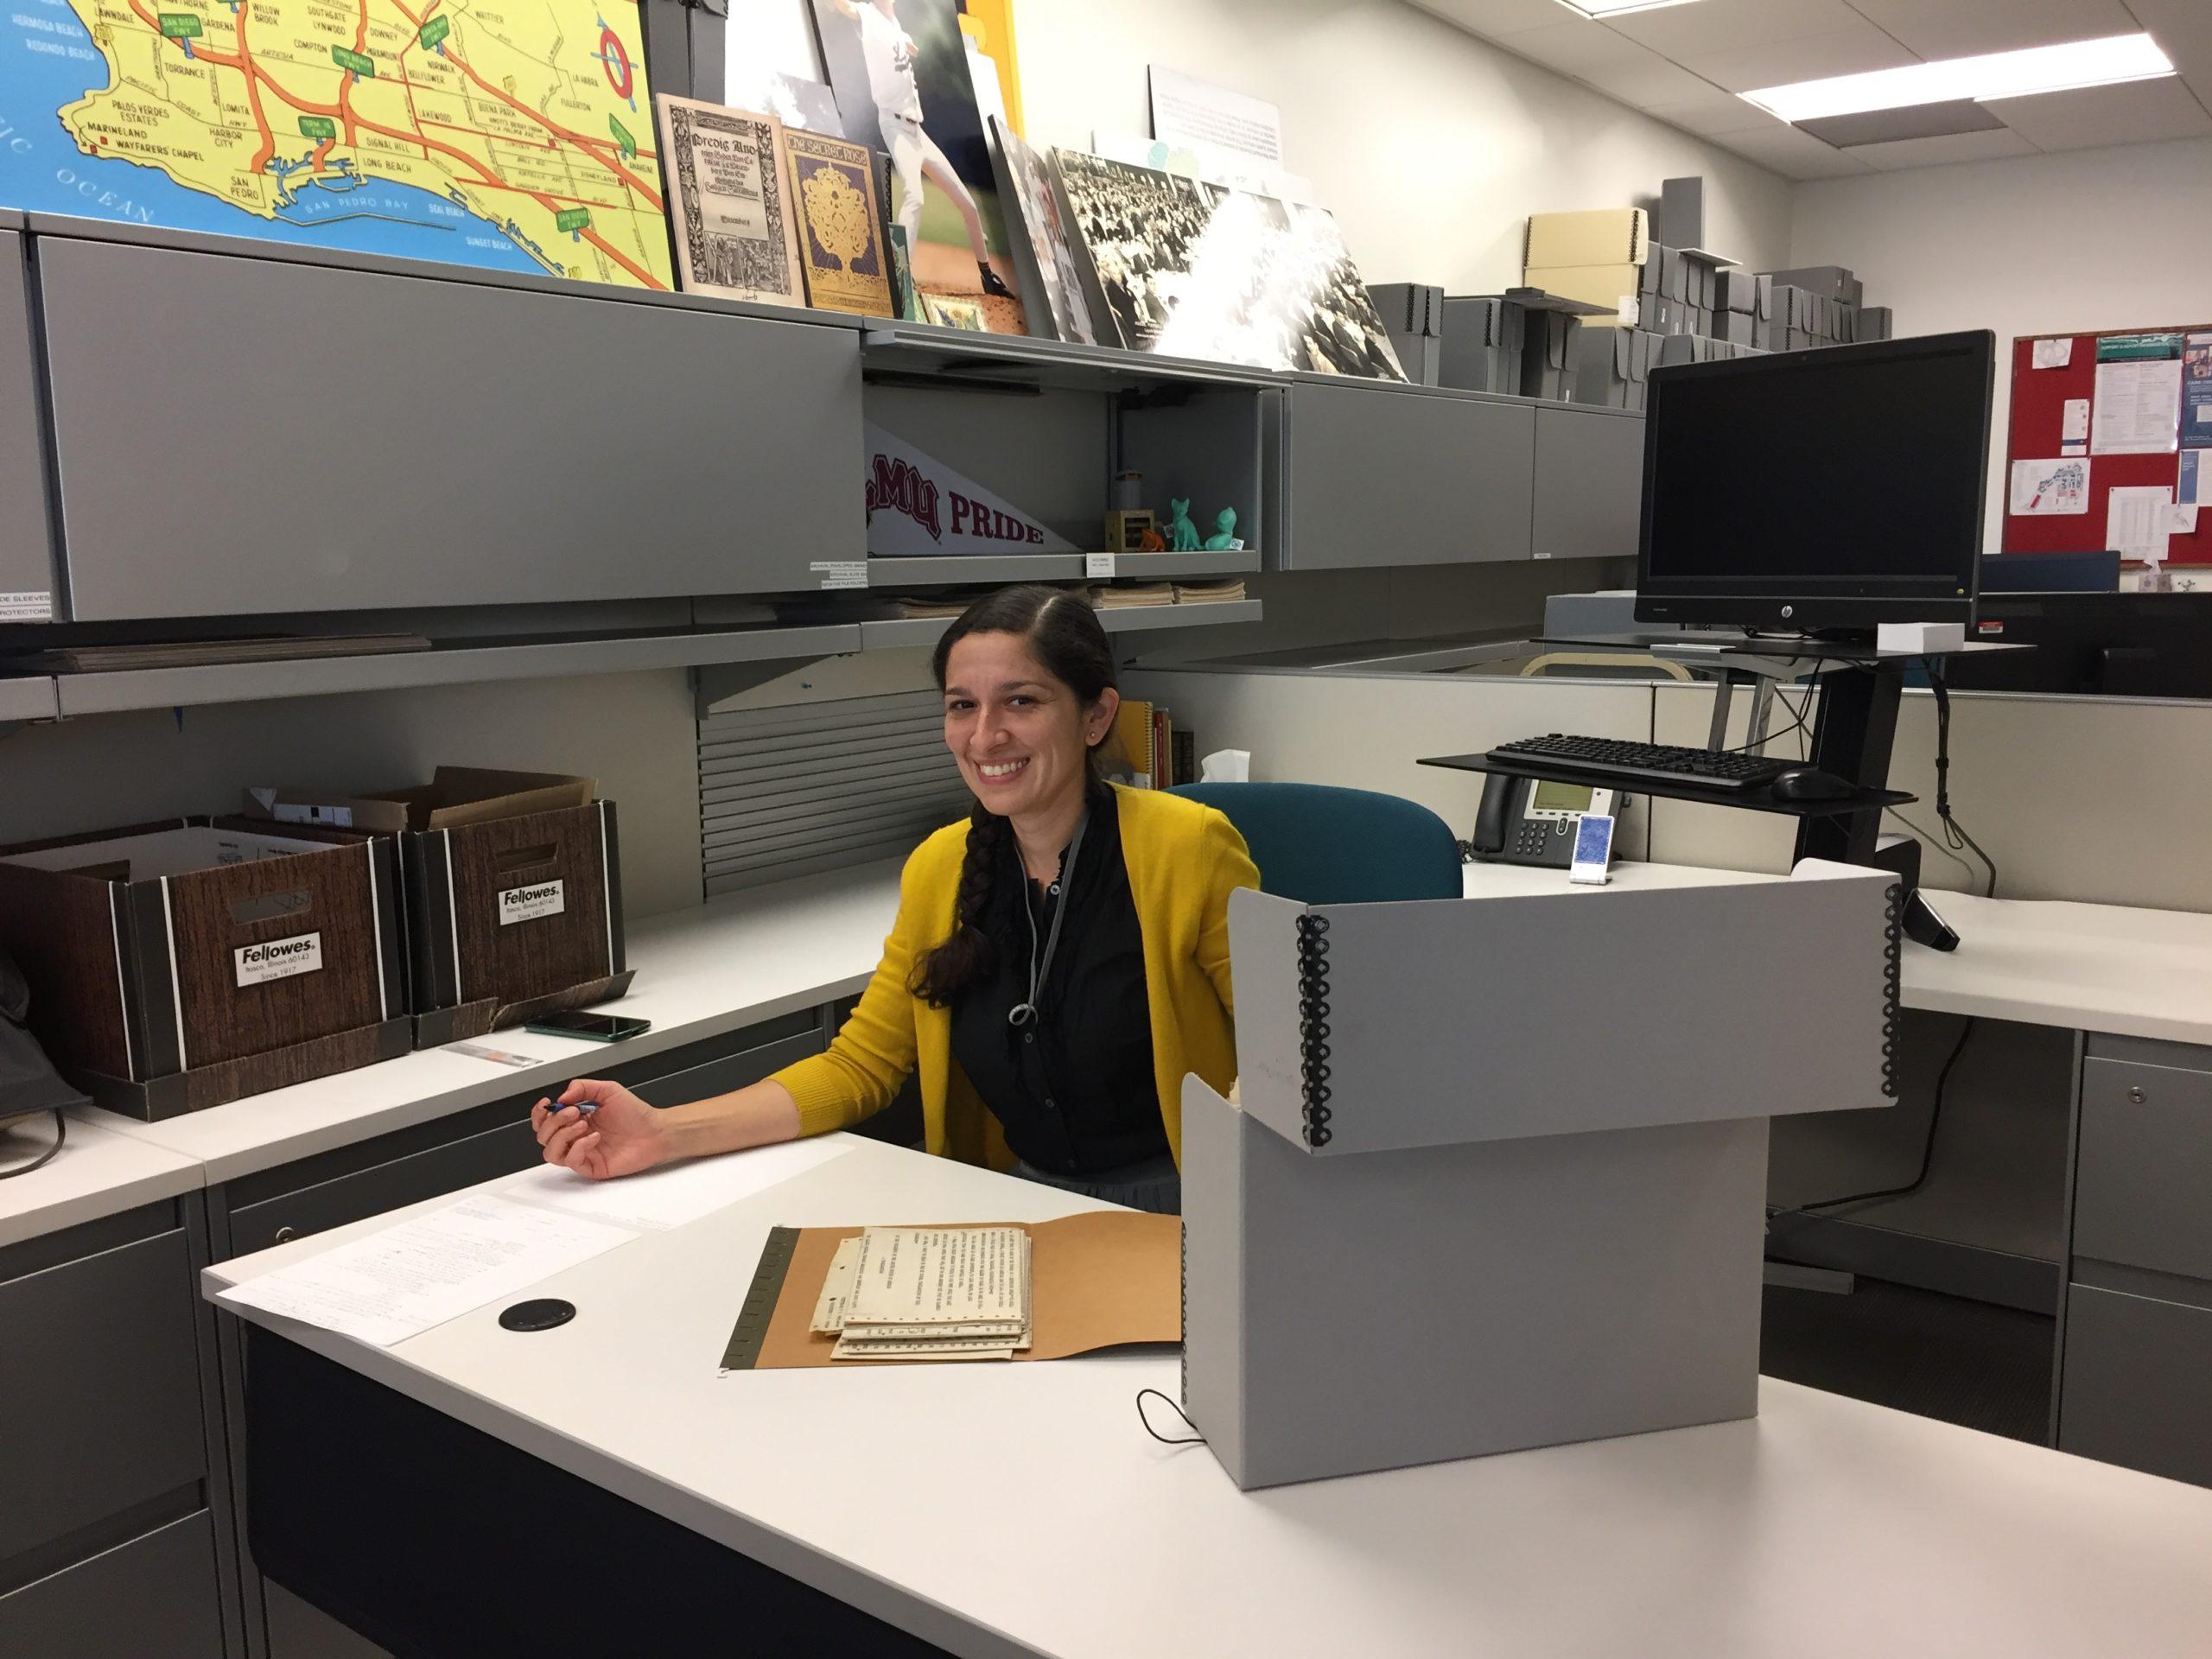 Marisa Ramirez at her desk